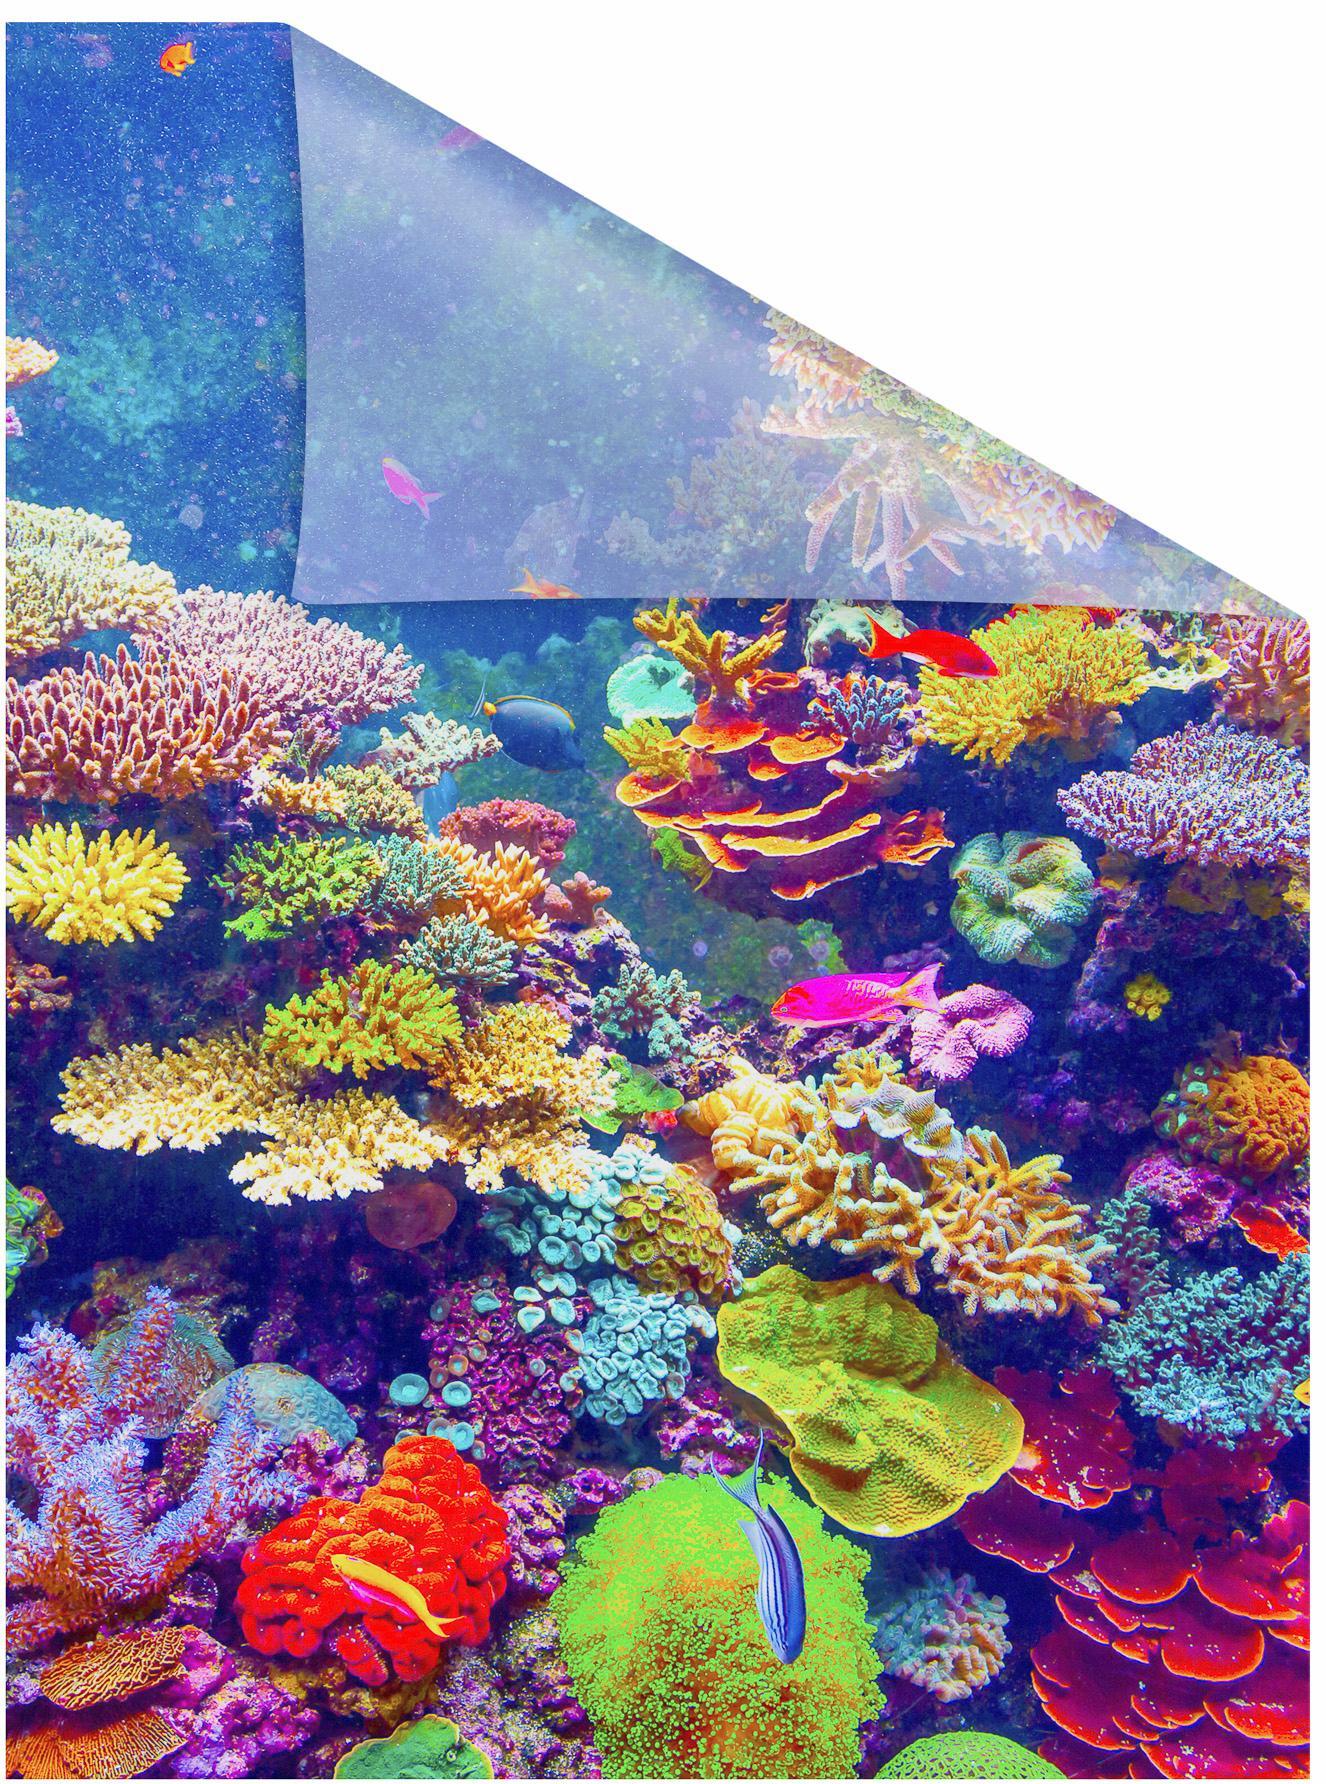 fensterfolie aquarium lichtblick blickdicht. Black Bedroom Furniture Sets. Home Design Ideas